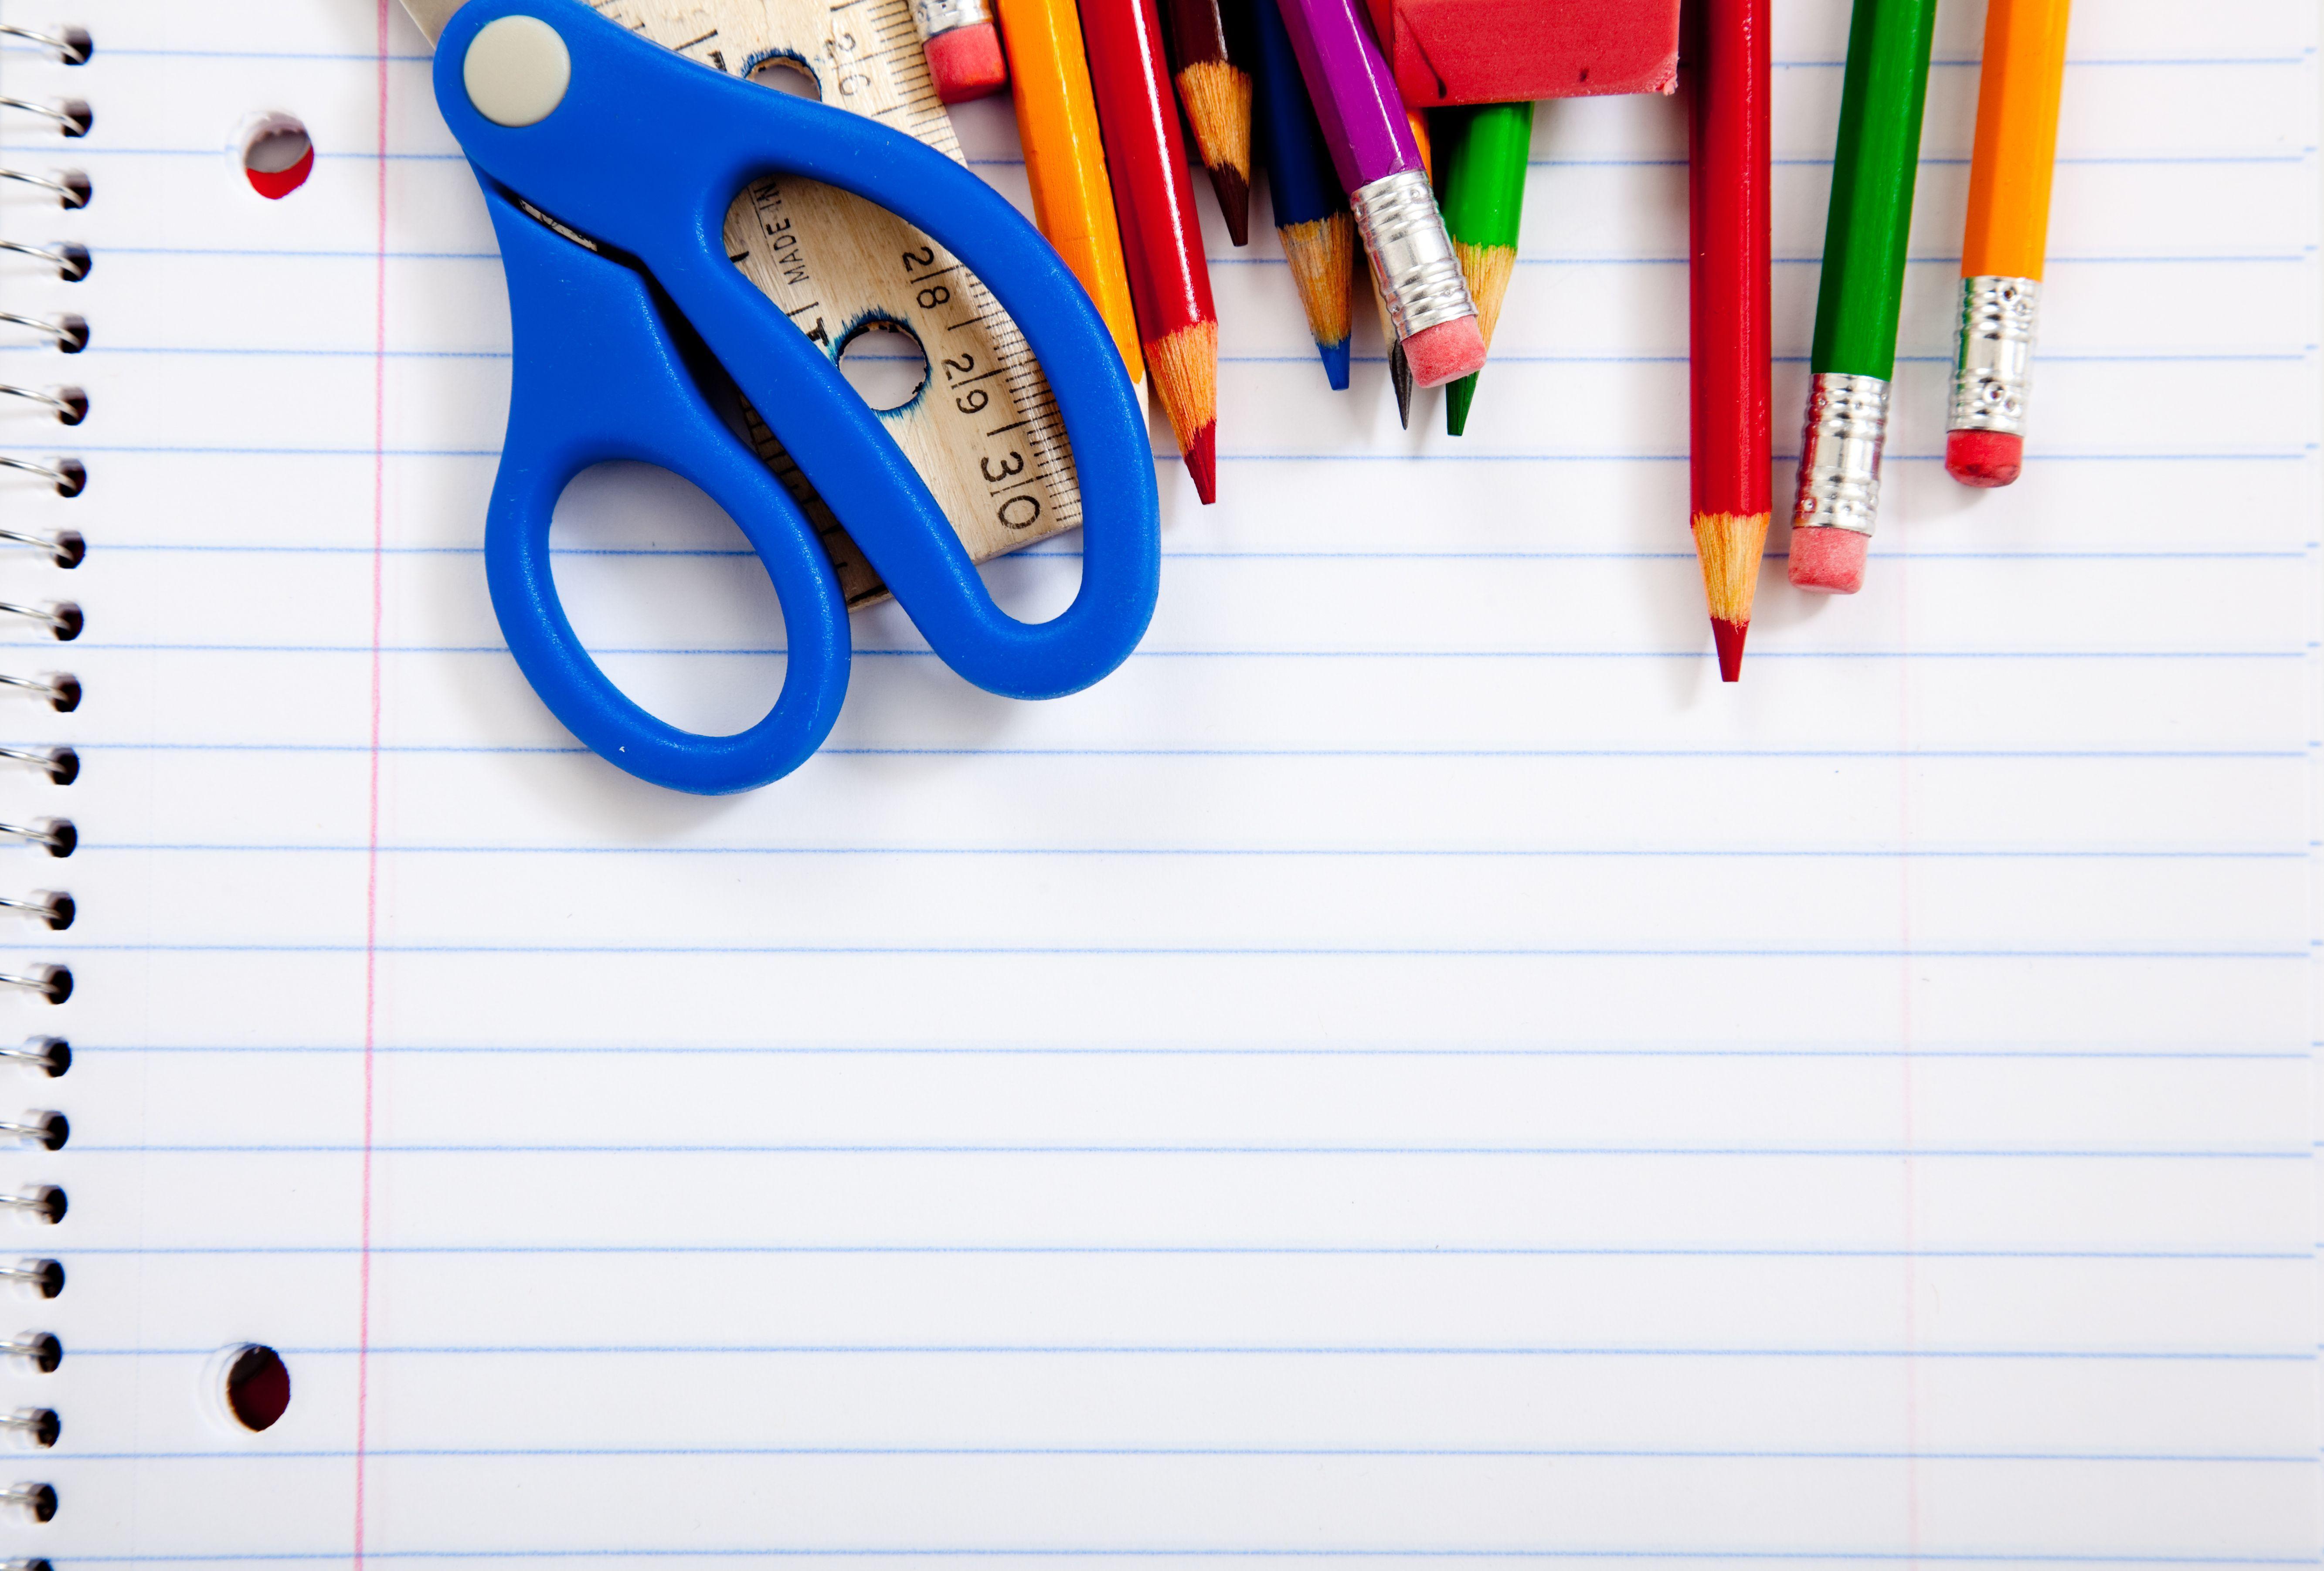 School Supplies Wallpapers Top Free School Supplies Backgrounds Wallpaperaccess